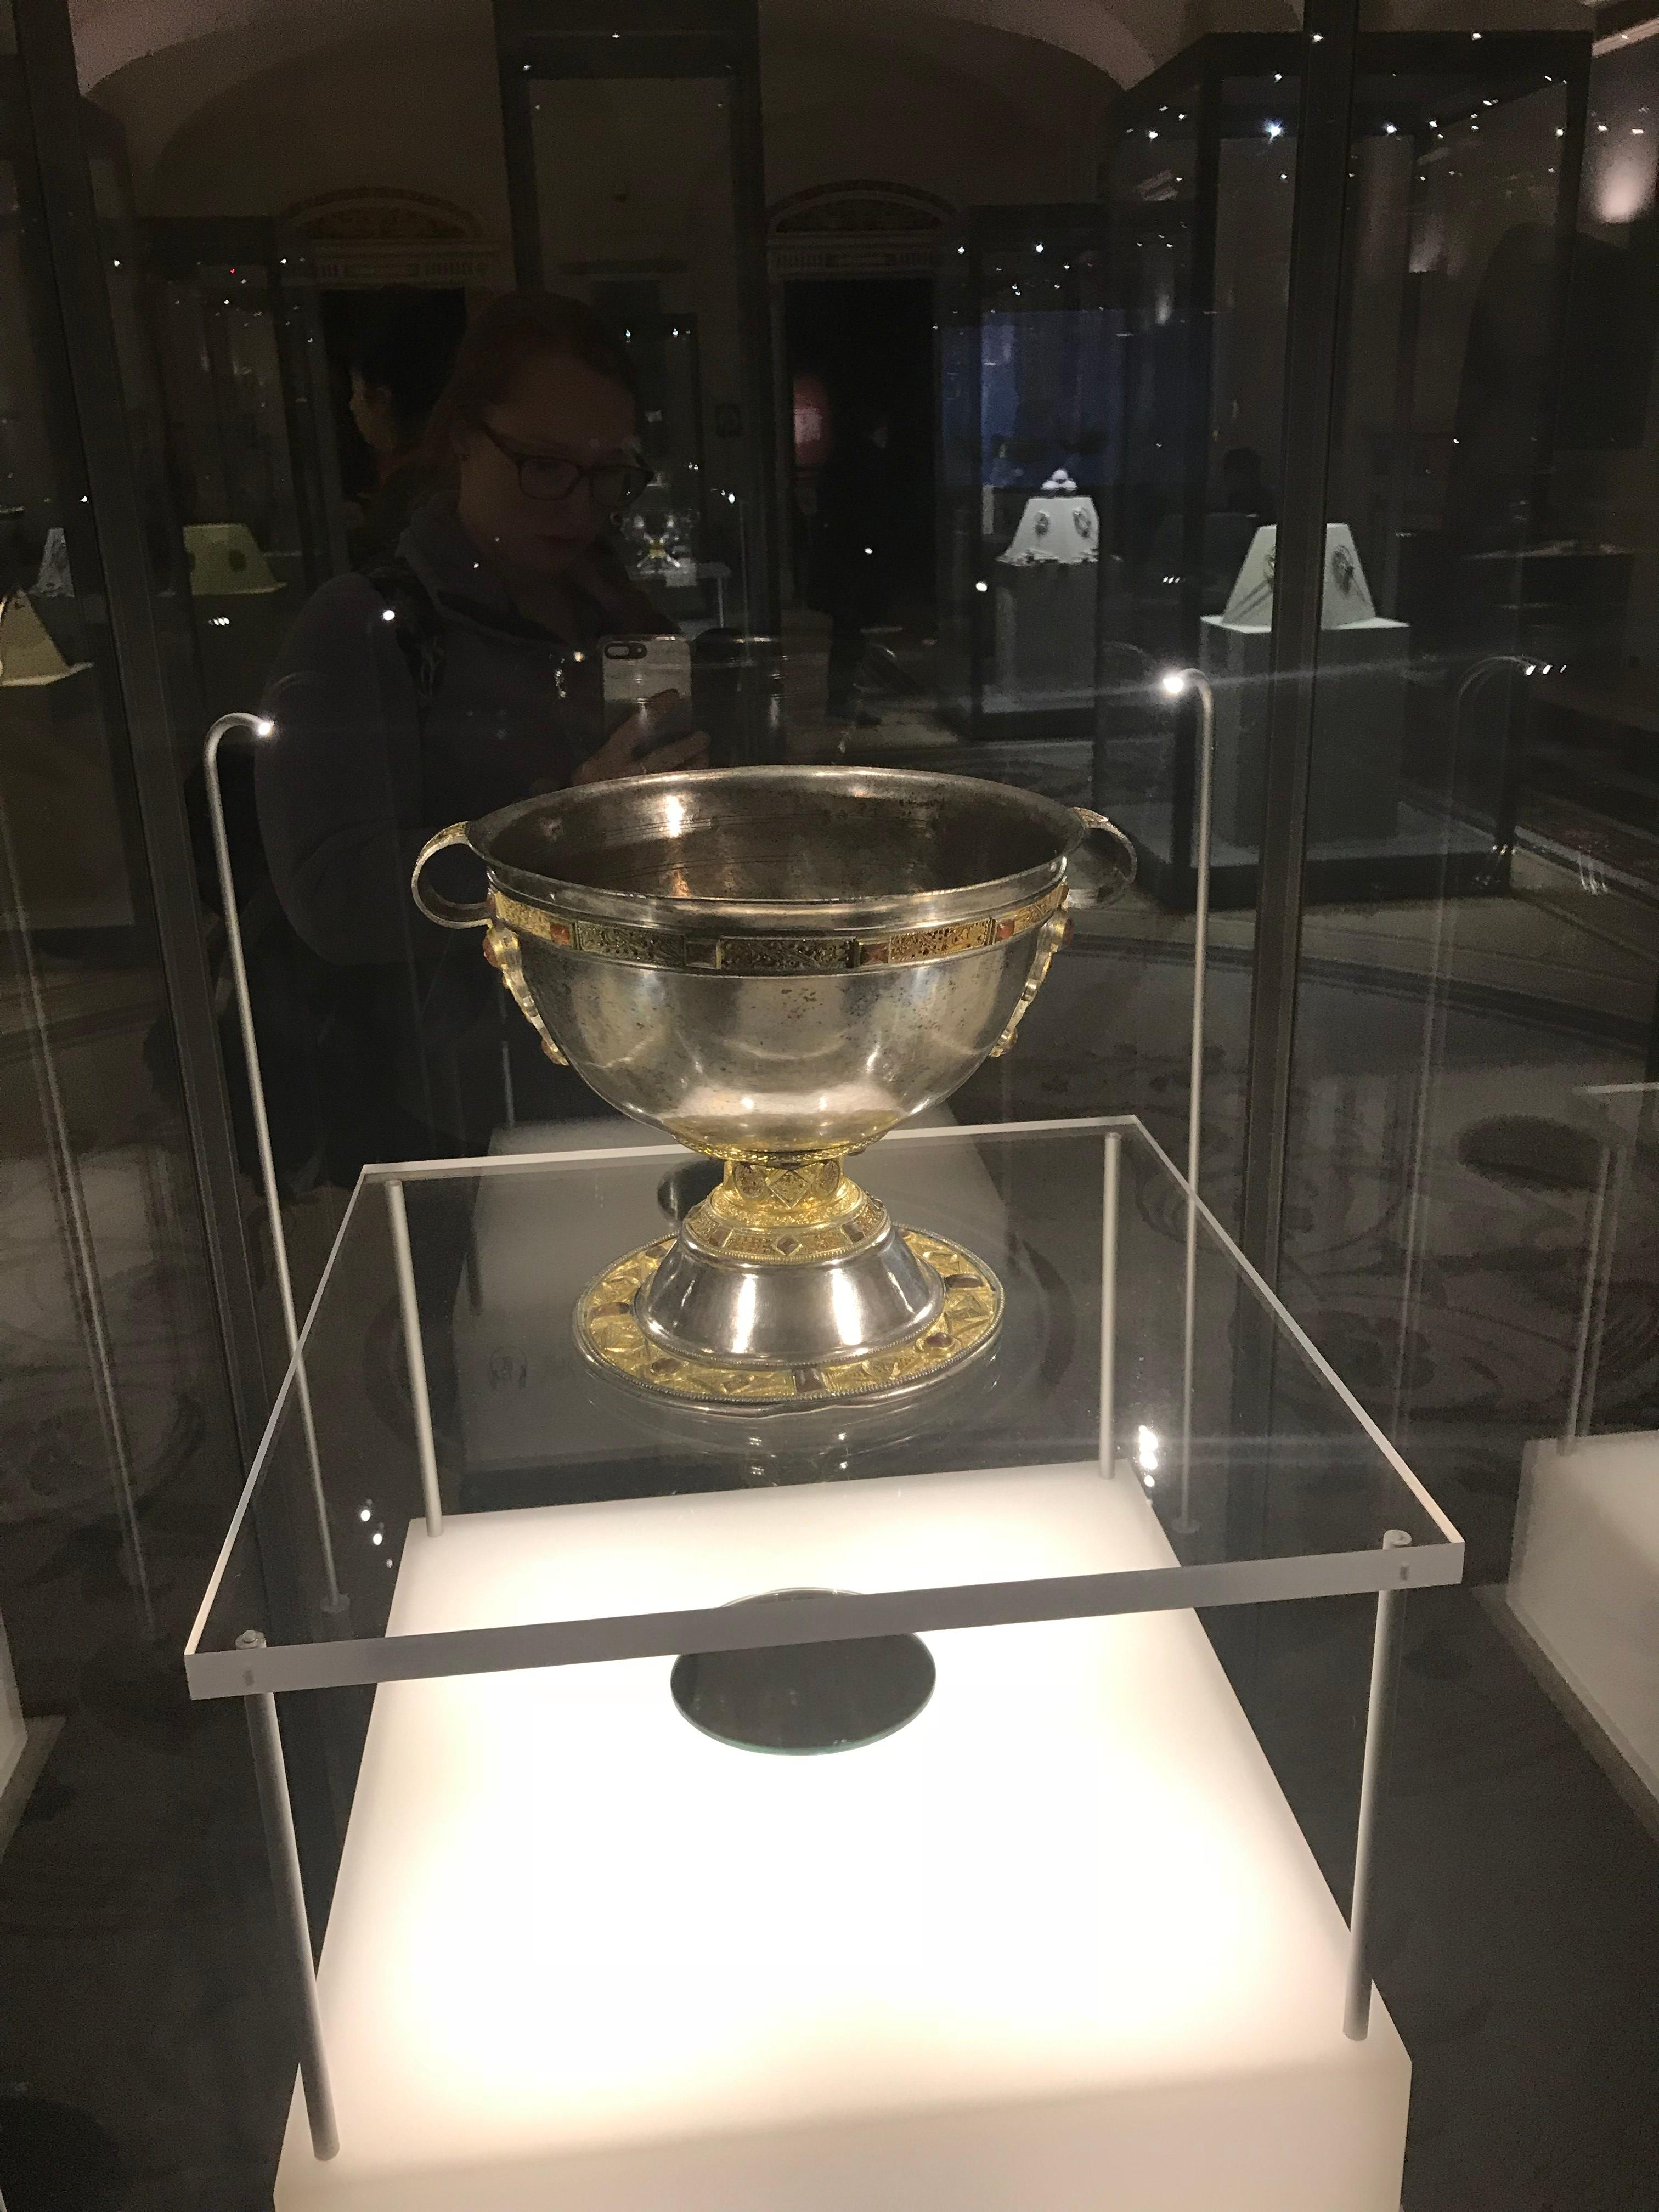 CAPAStudyAbroad_Dublin_Spring2018_From Brandon Mooney - Aradagh Cup.jpeg